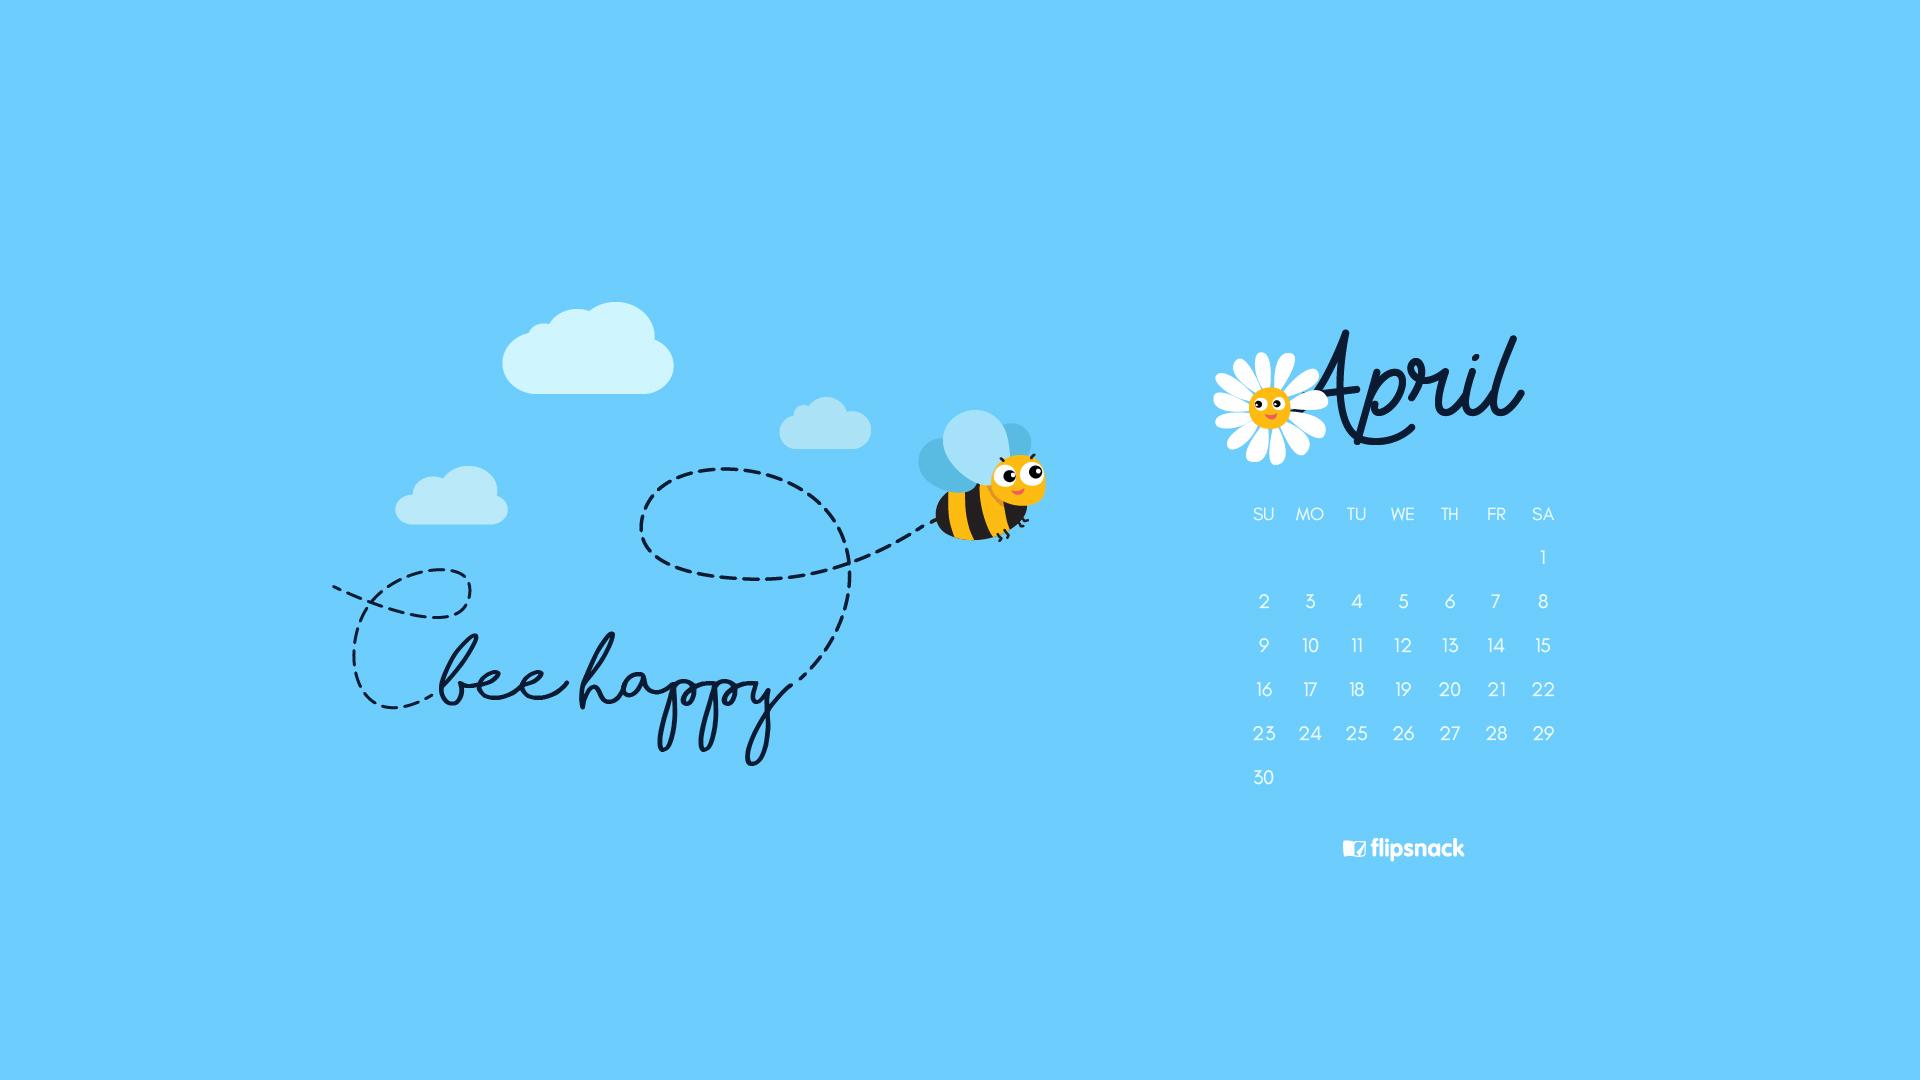 Freebie April 2017 wallpaper calendar desktop background 1920x1080